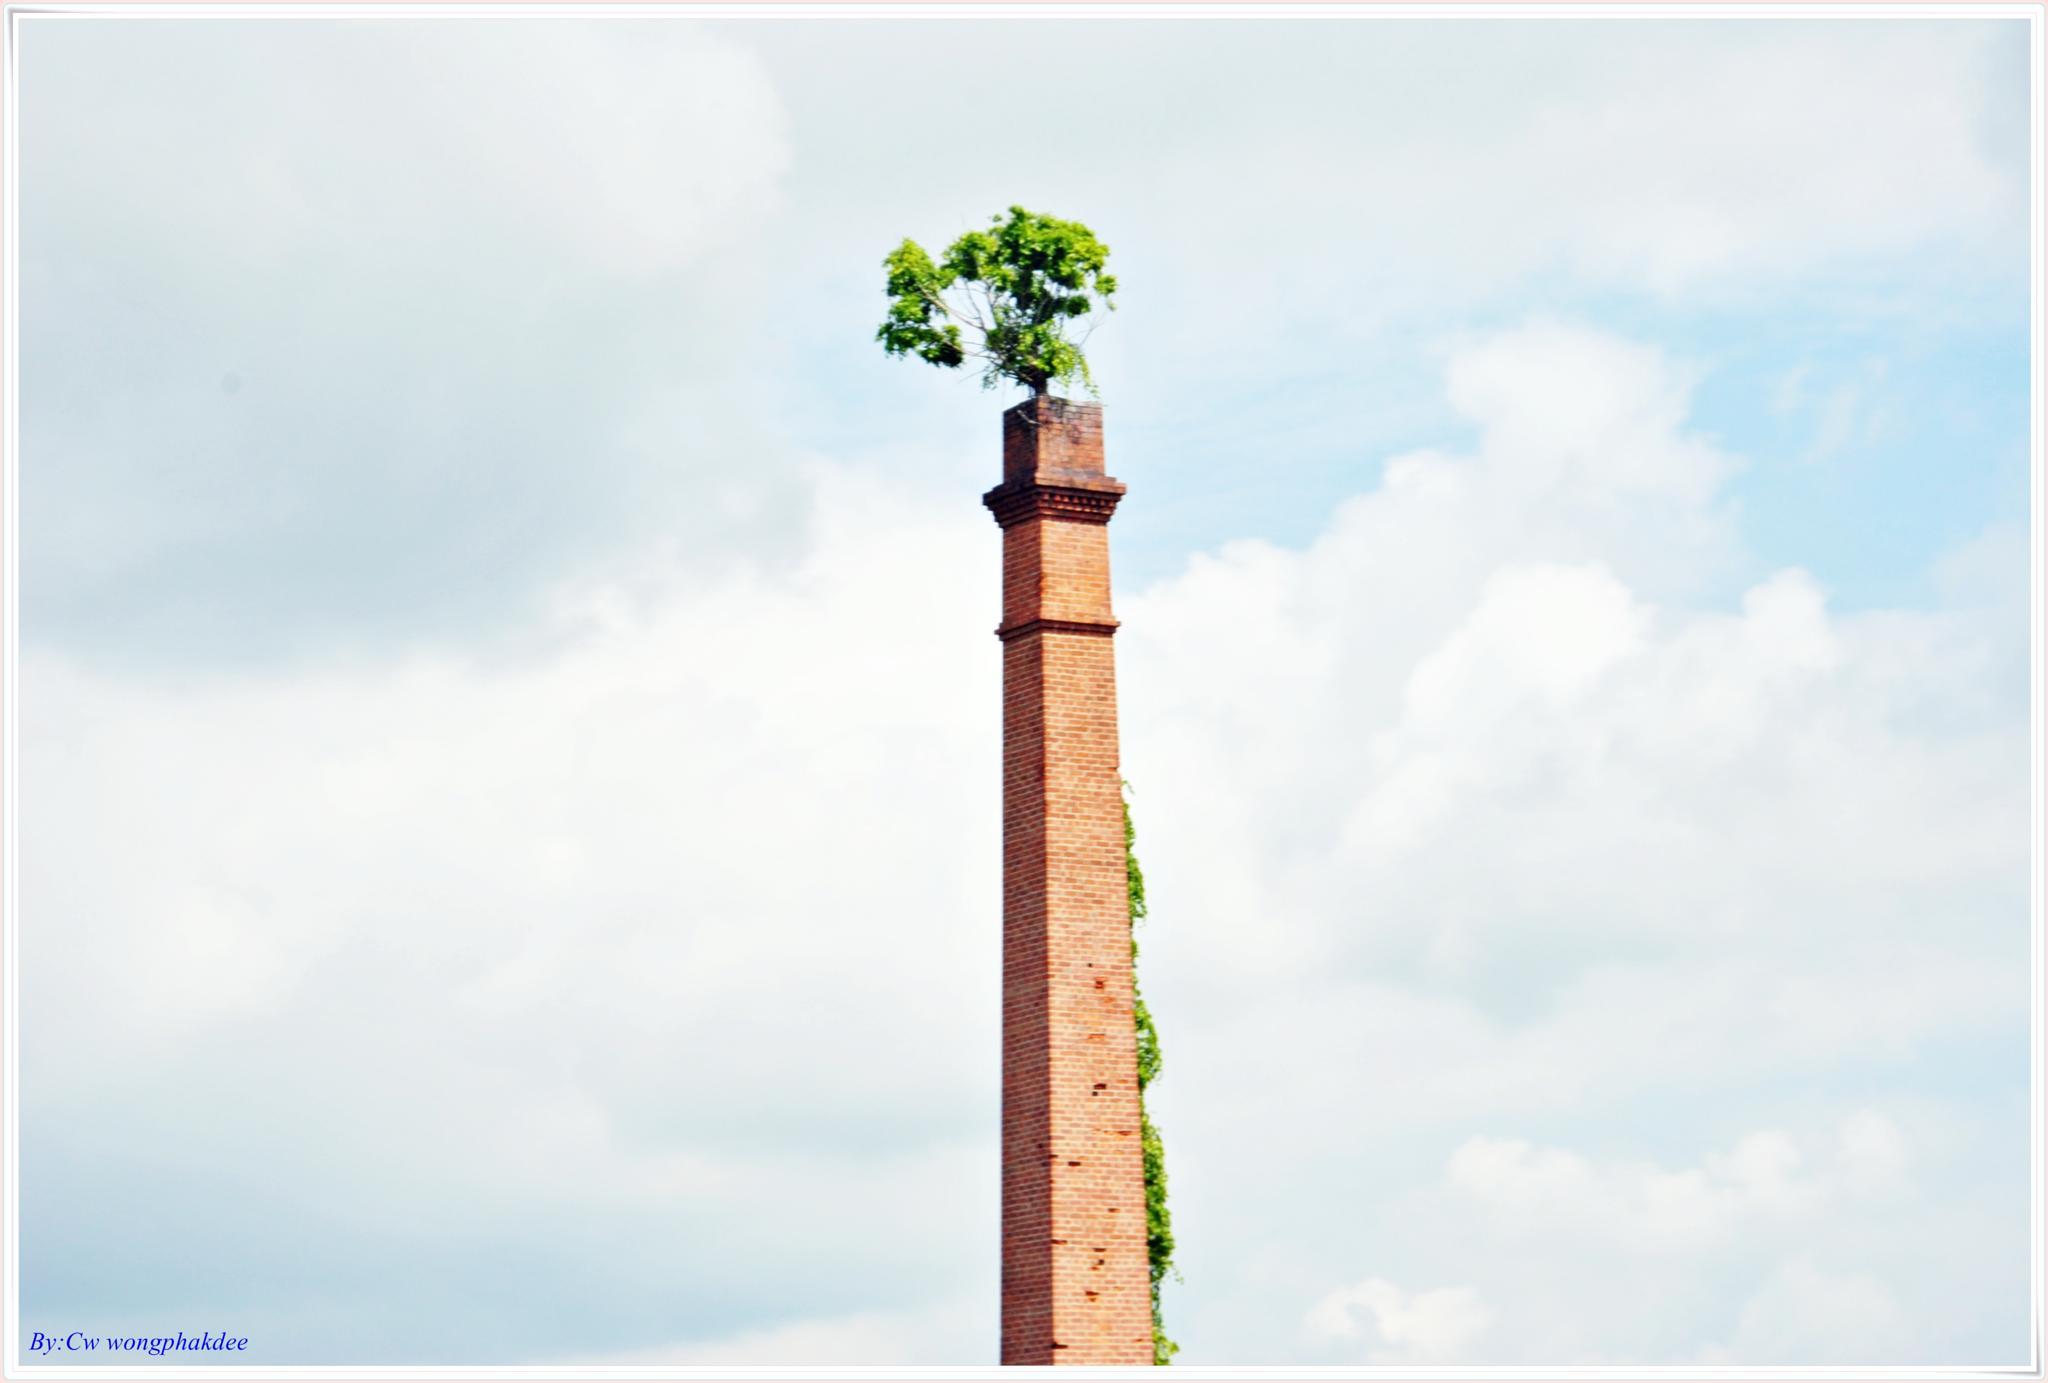 Chimney tree by Wongphakdee